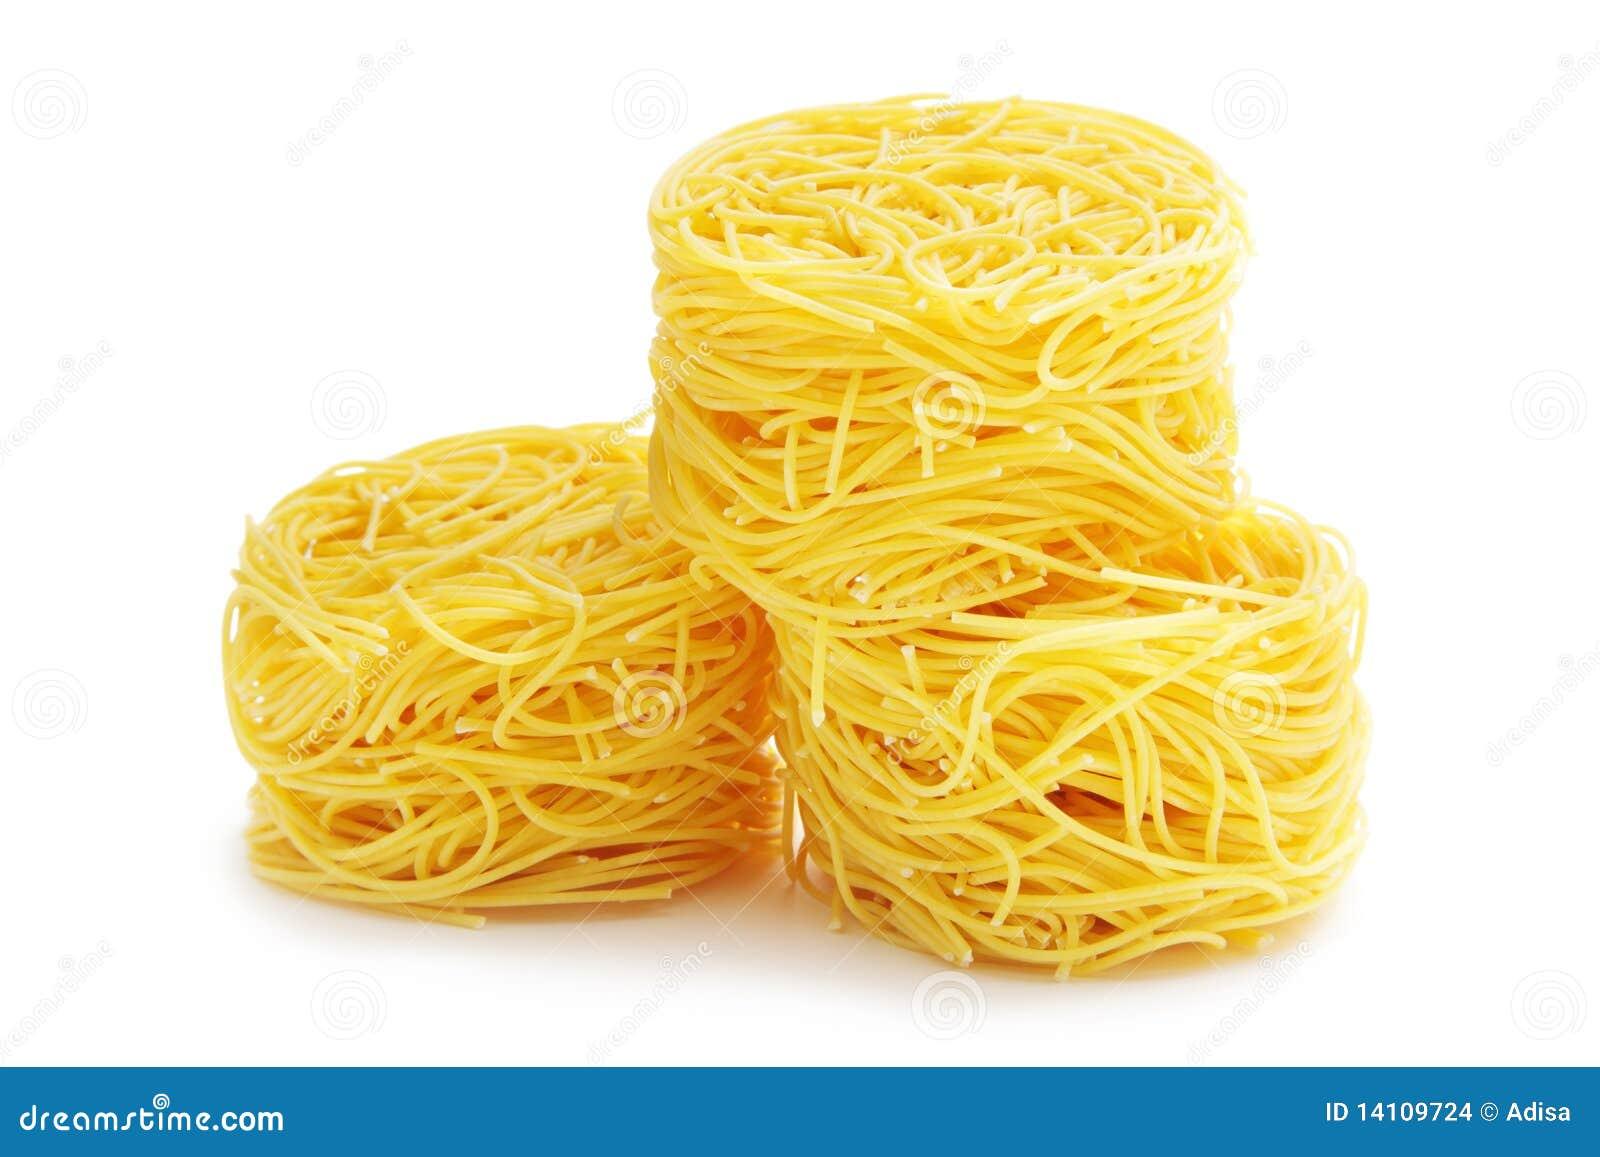 Free Kitchen Design App Vermicelli Pasta Nests Stock Images Image 14109724